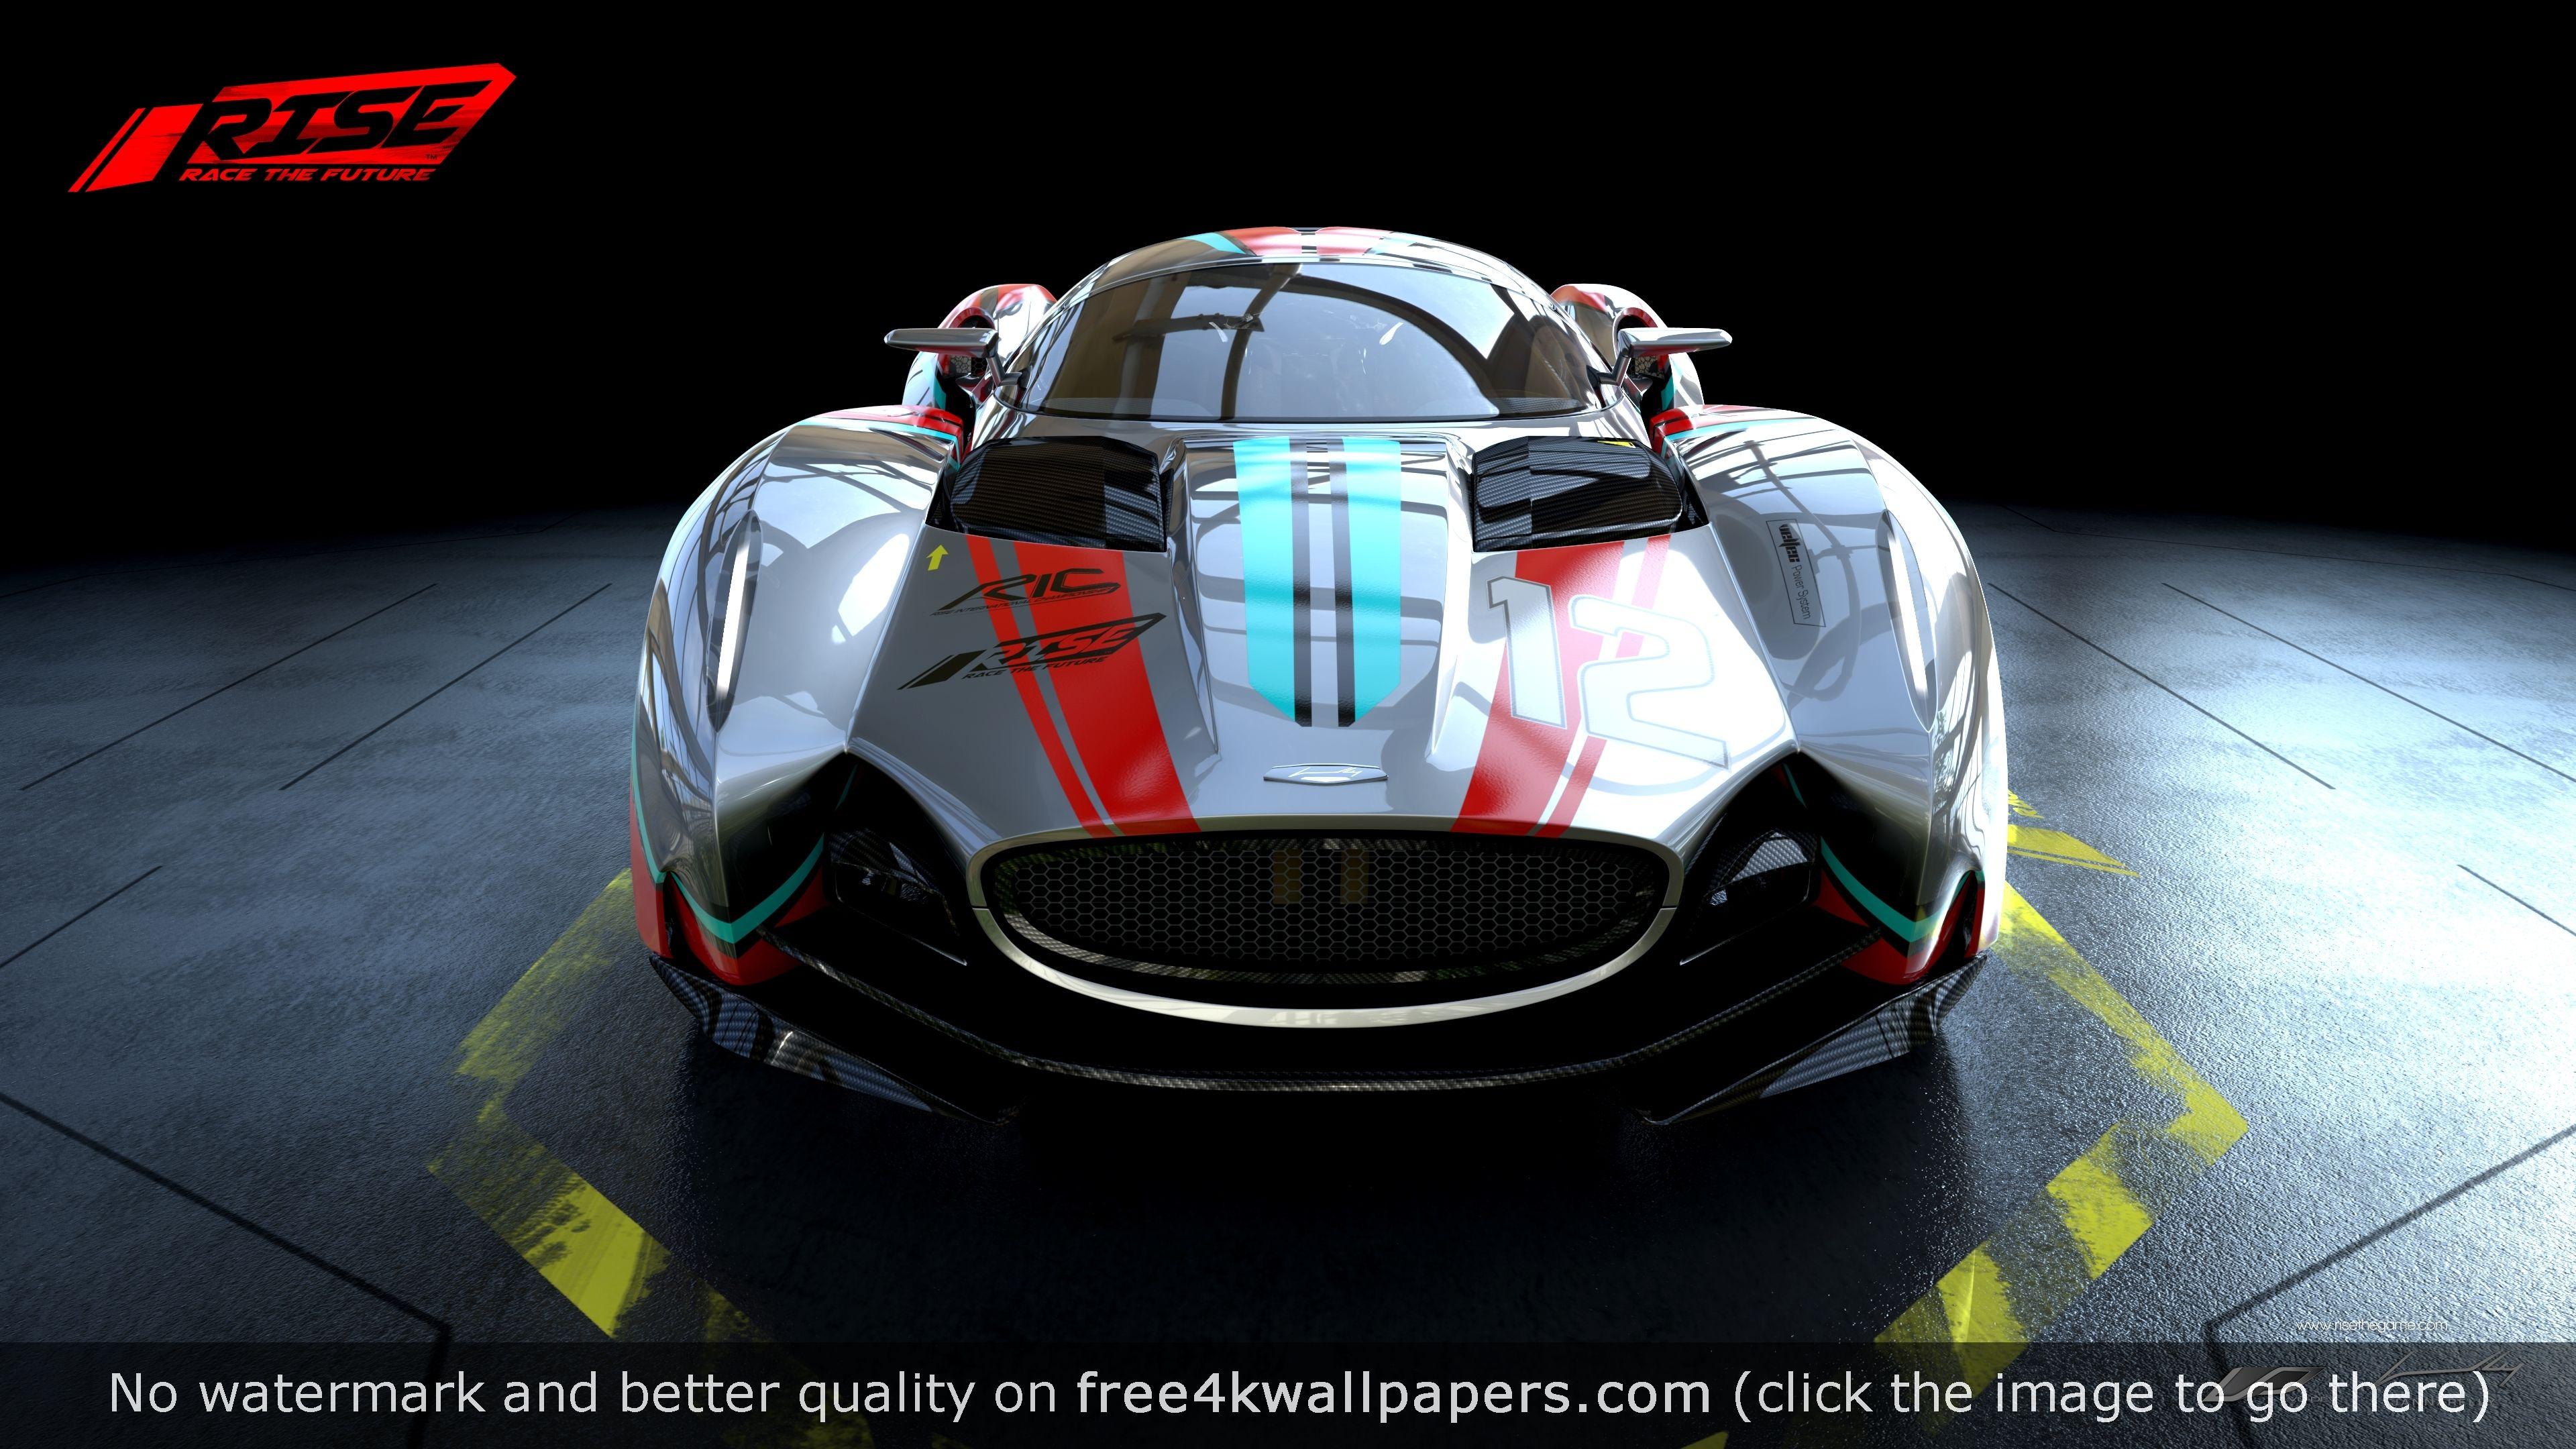 Rise Race The Future Game 4k Wallpaper Racing Future Games Racing Games Lexus rc f gt3 racing 4k wallpaper